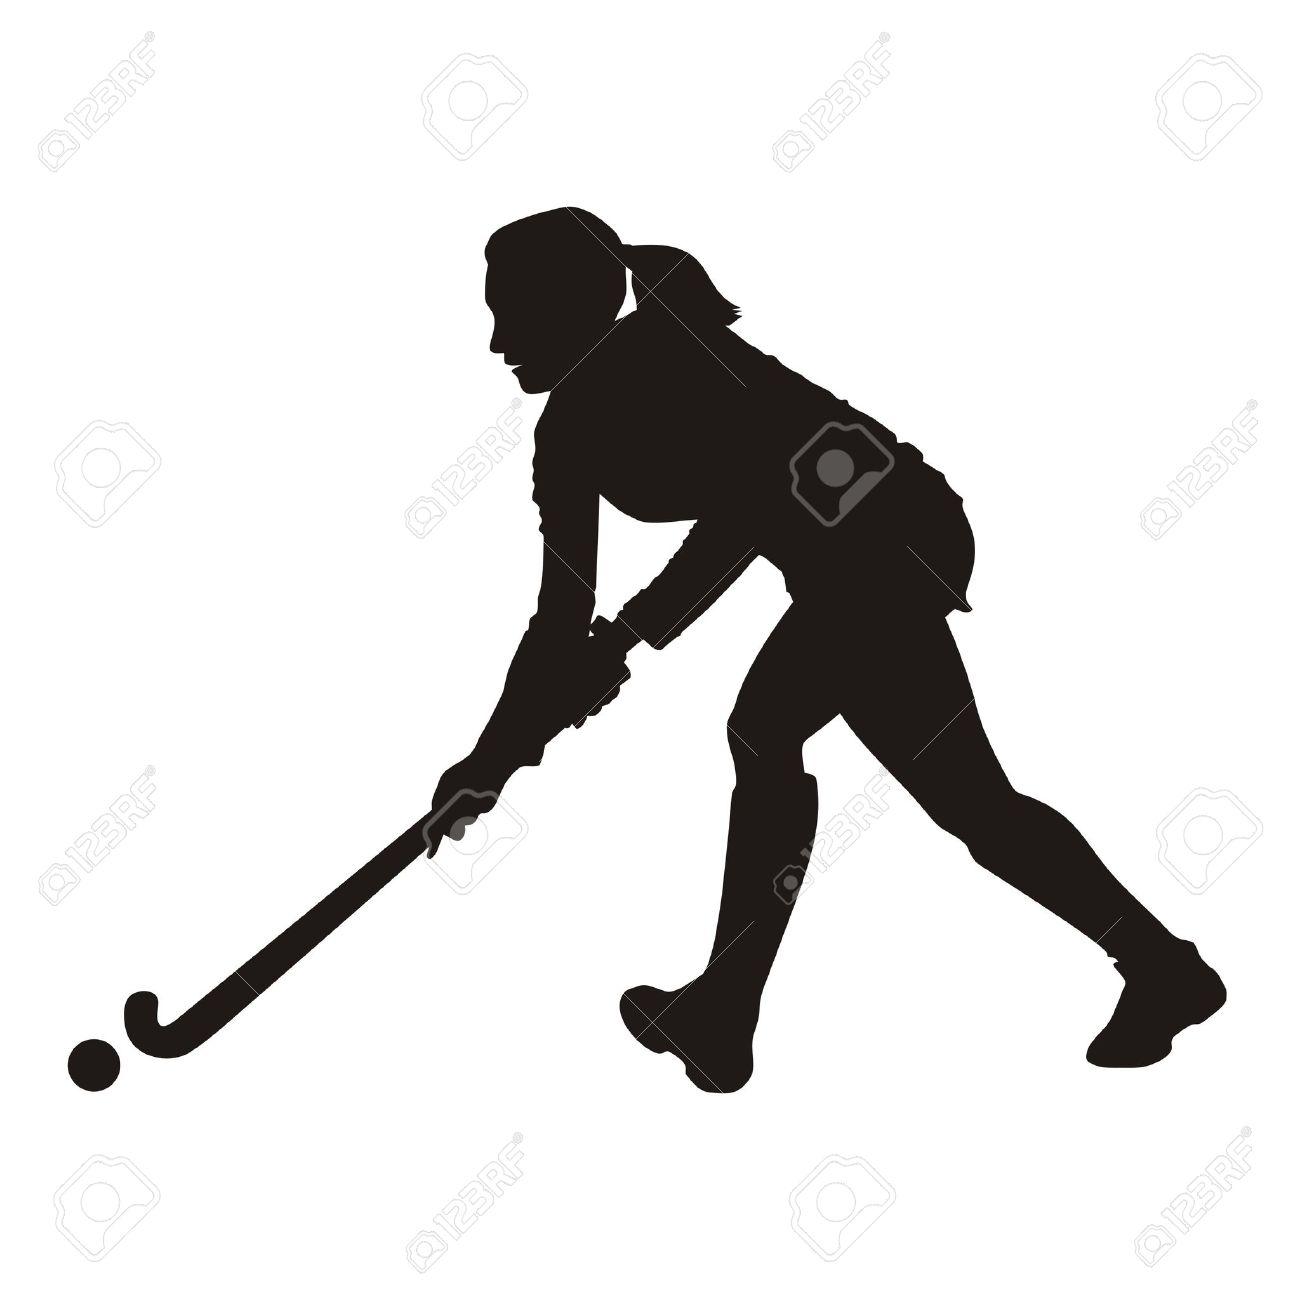 Field Hockey player silhouette Stock Photo - 10419436